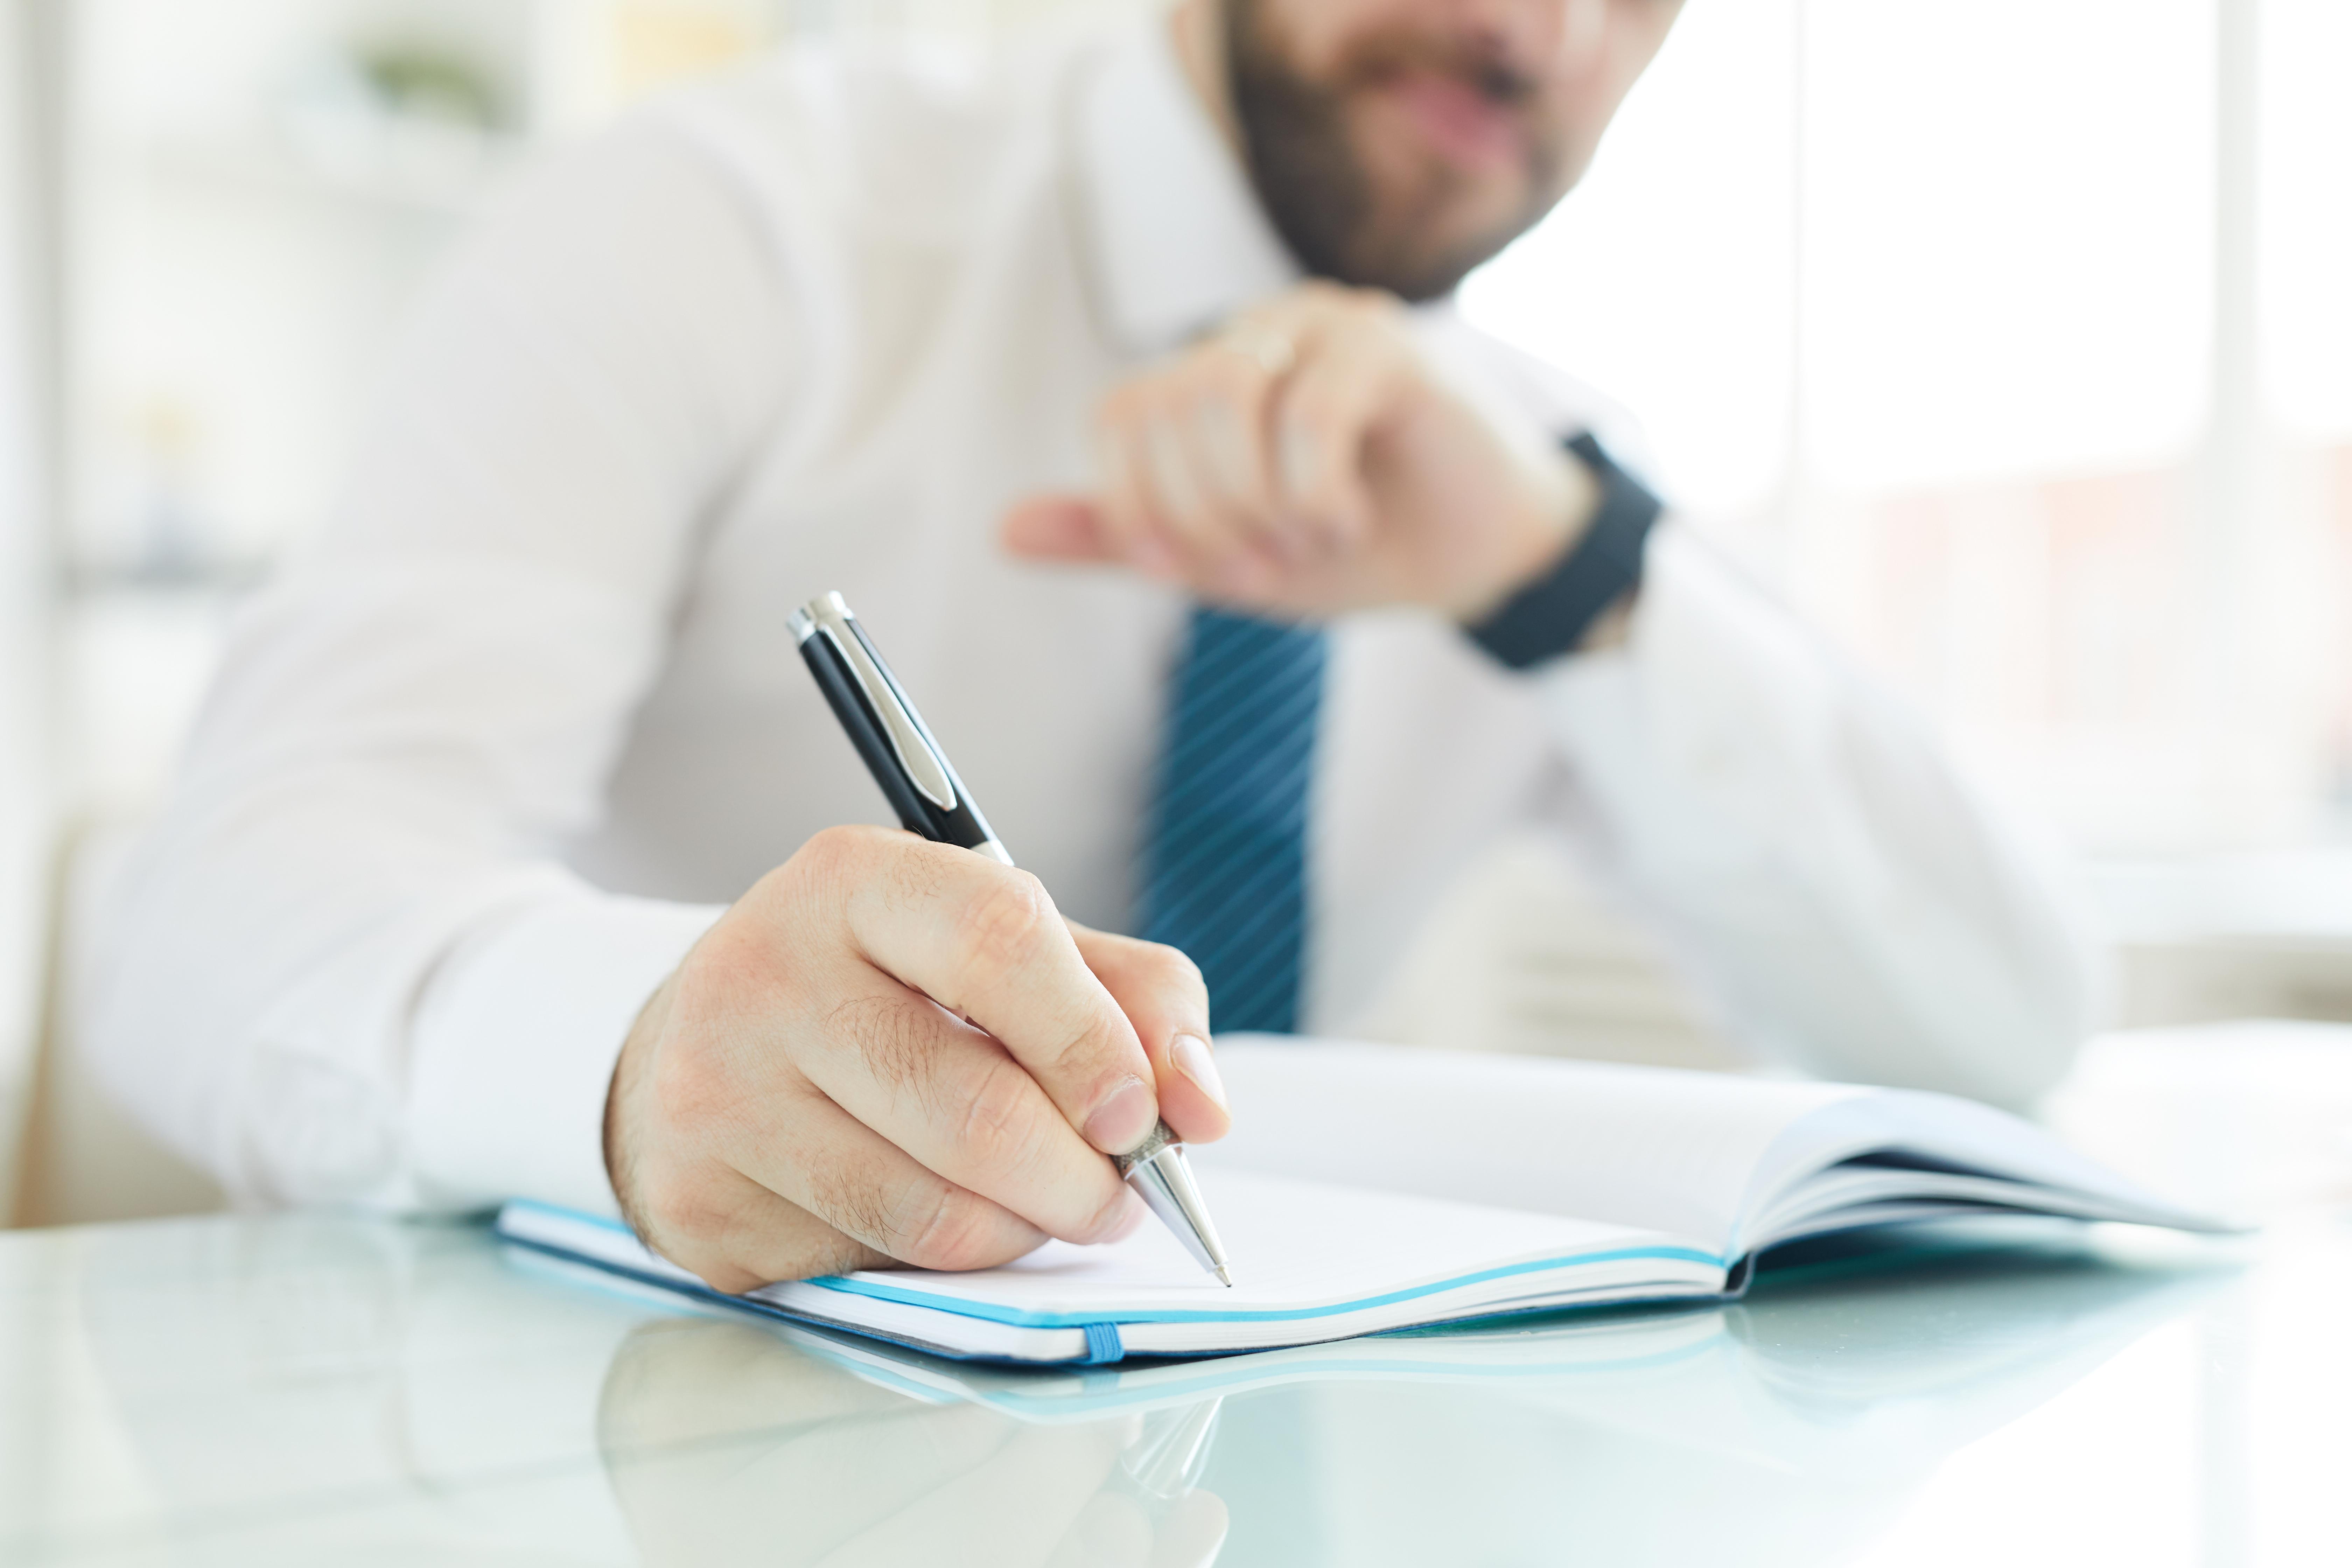 businessman-scheduling-day-in-office-76MXPFR